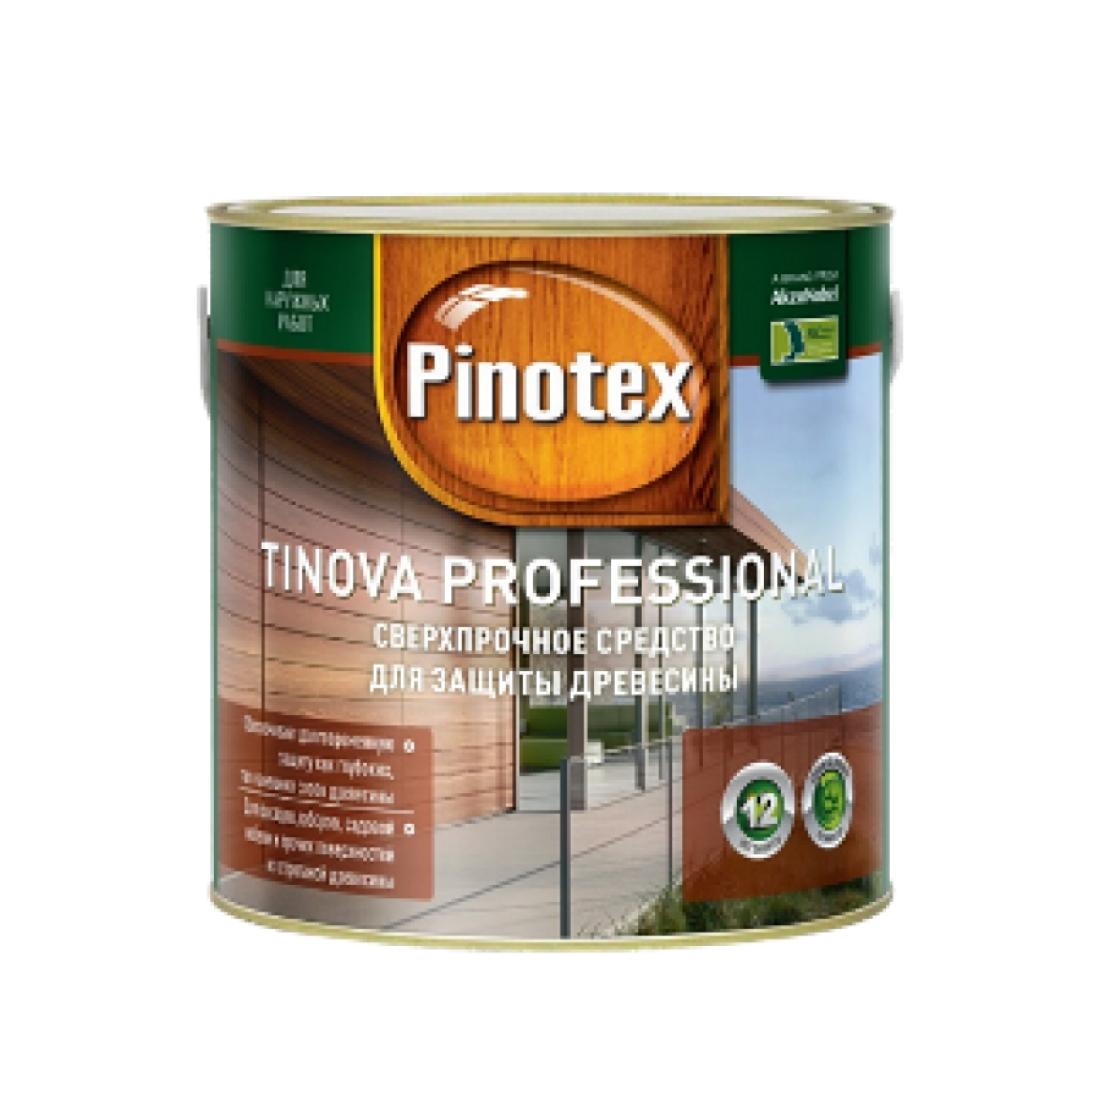 PINOTEX TINOVA антисептик профессиональный, цветной (2,5 л) Палисандр